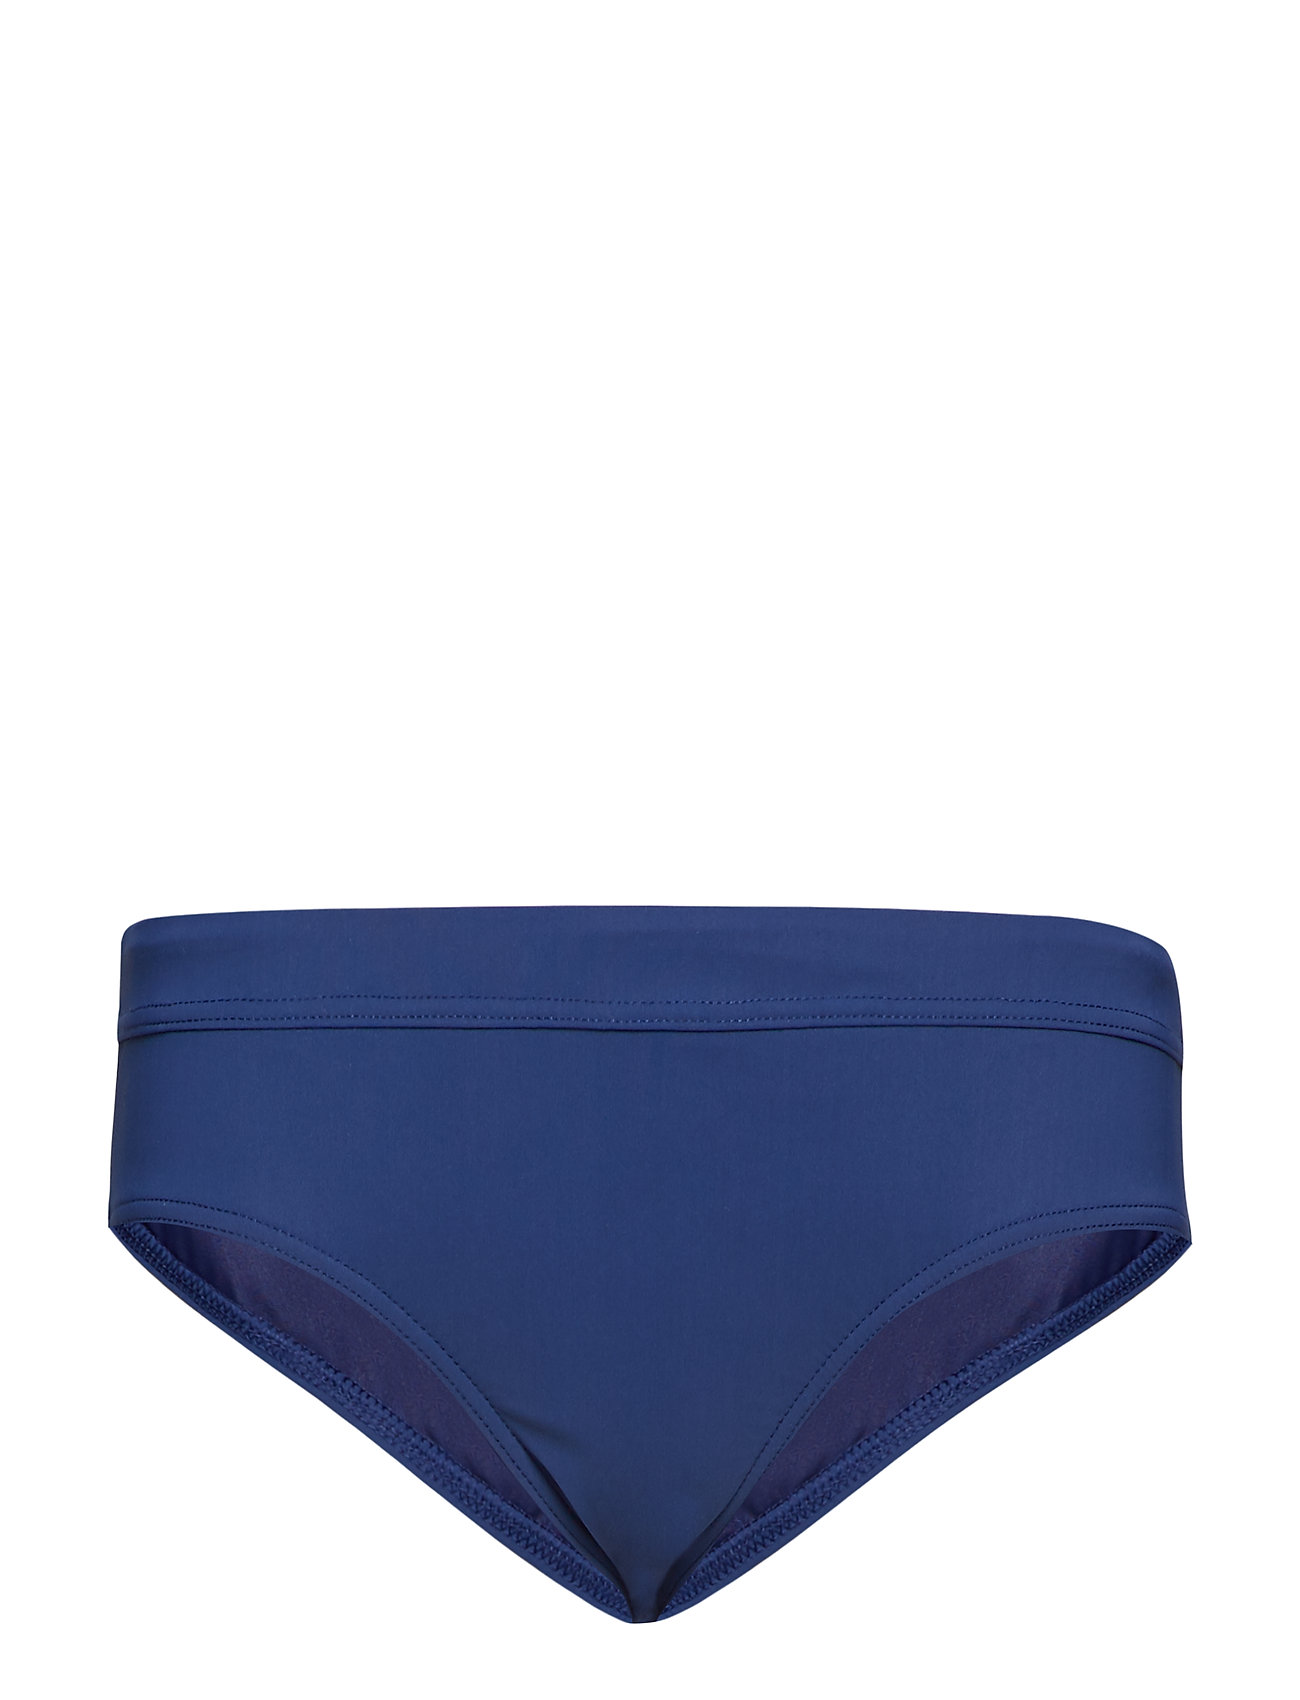 Filippa K Soft Sport Hip Bikini Bottom - INDIGO BLU